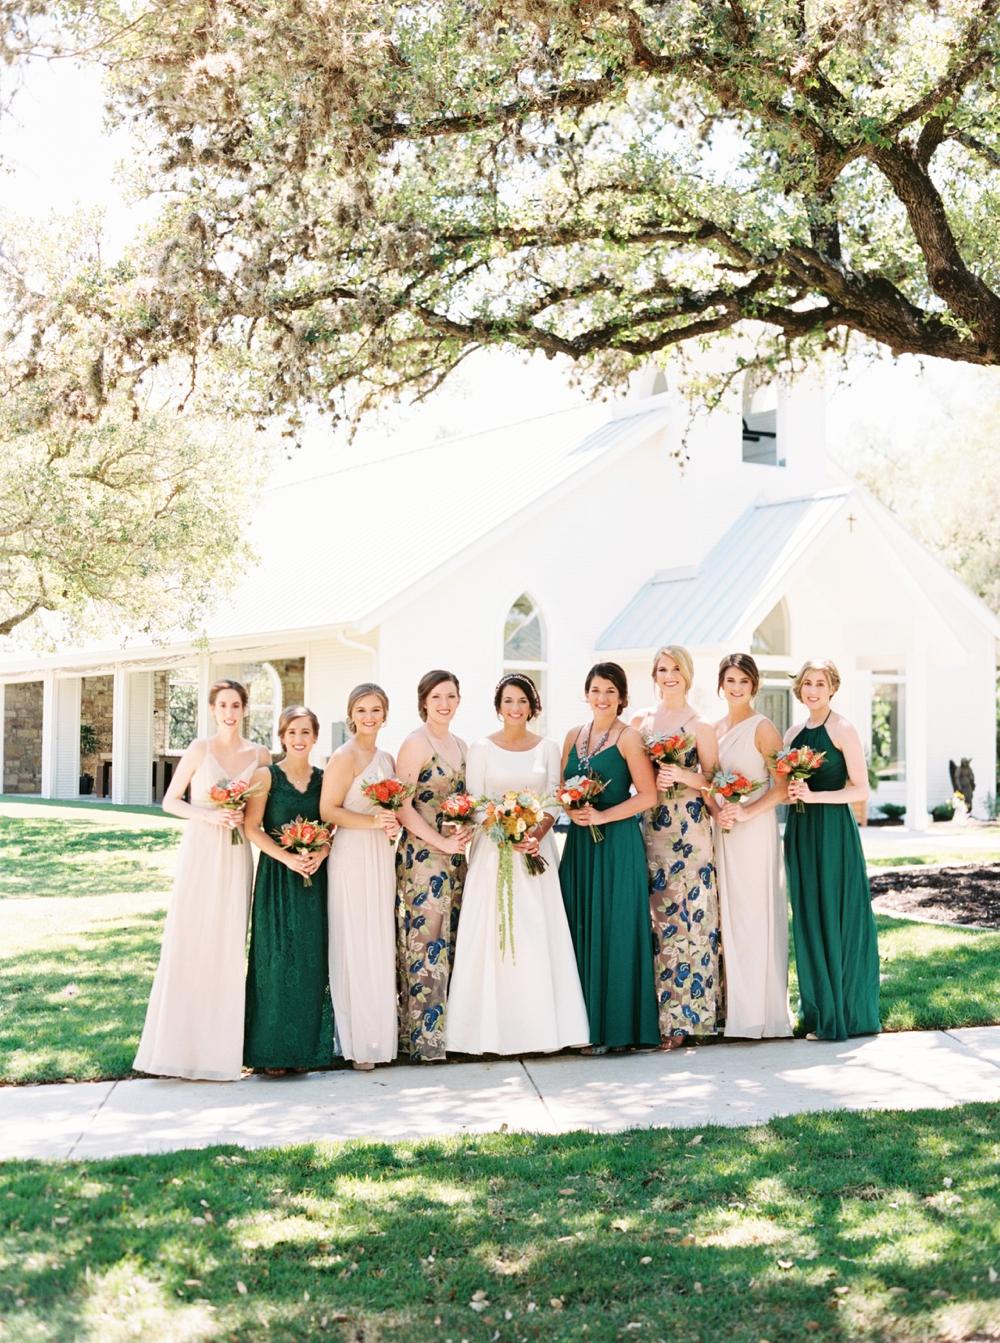 chandelier-of-gruene-wedding36.jpg